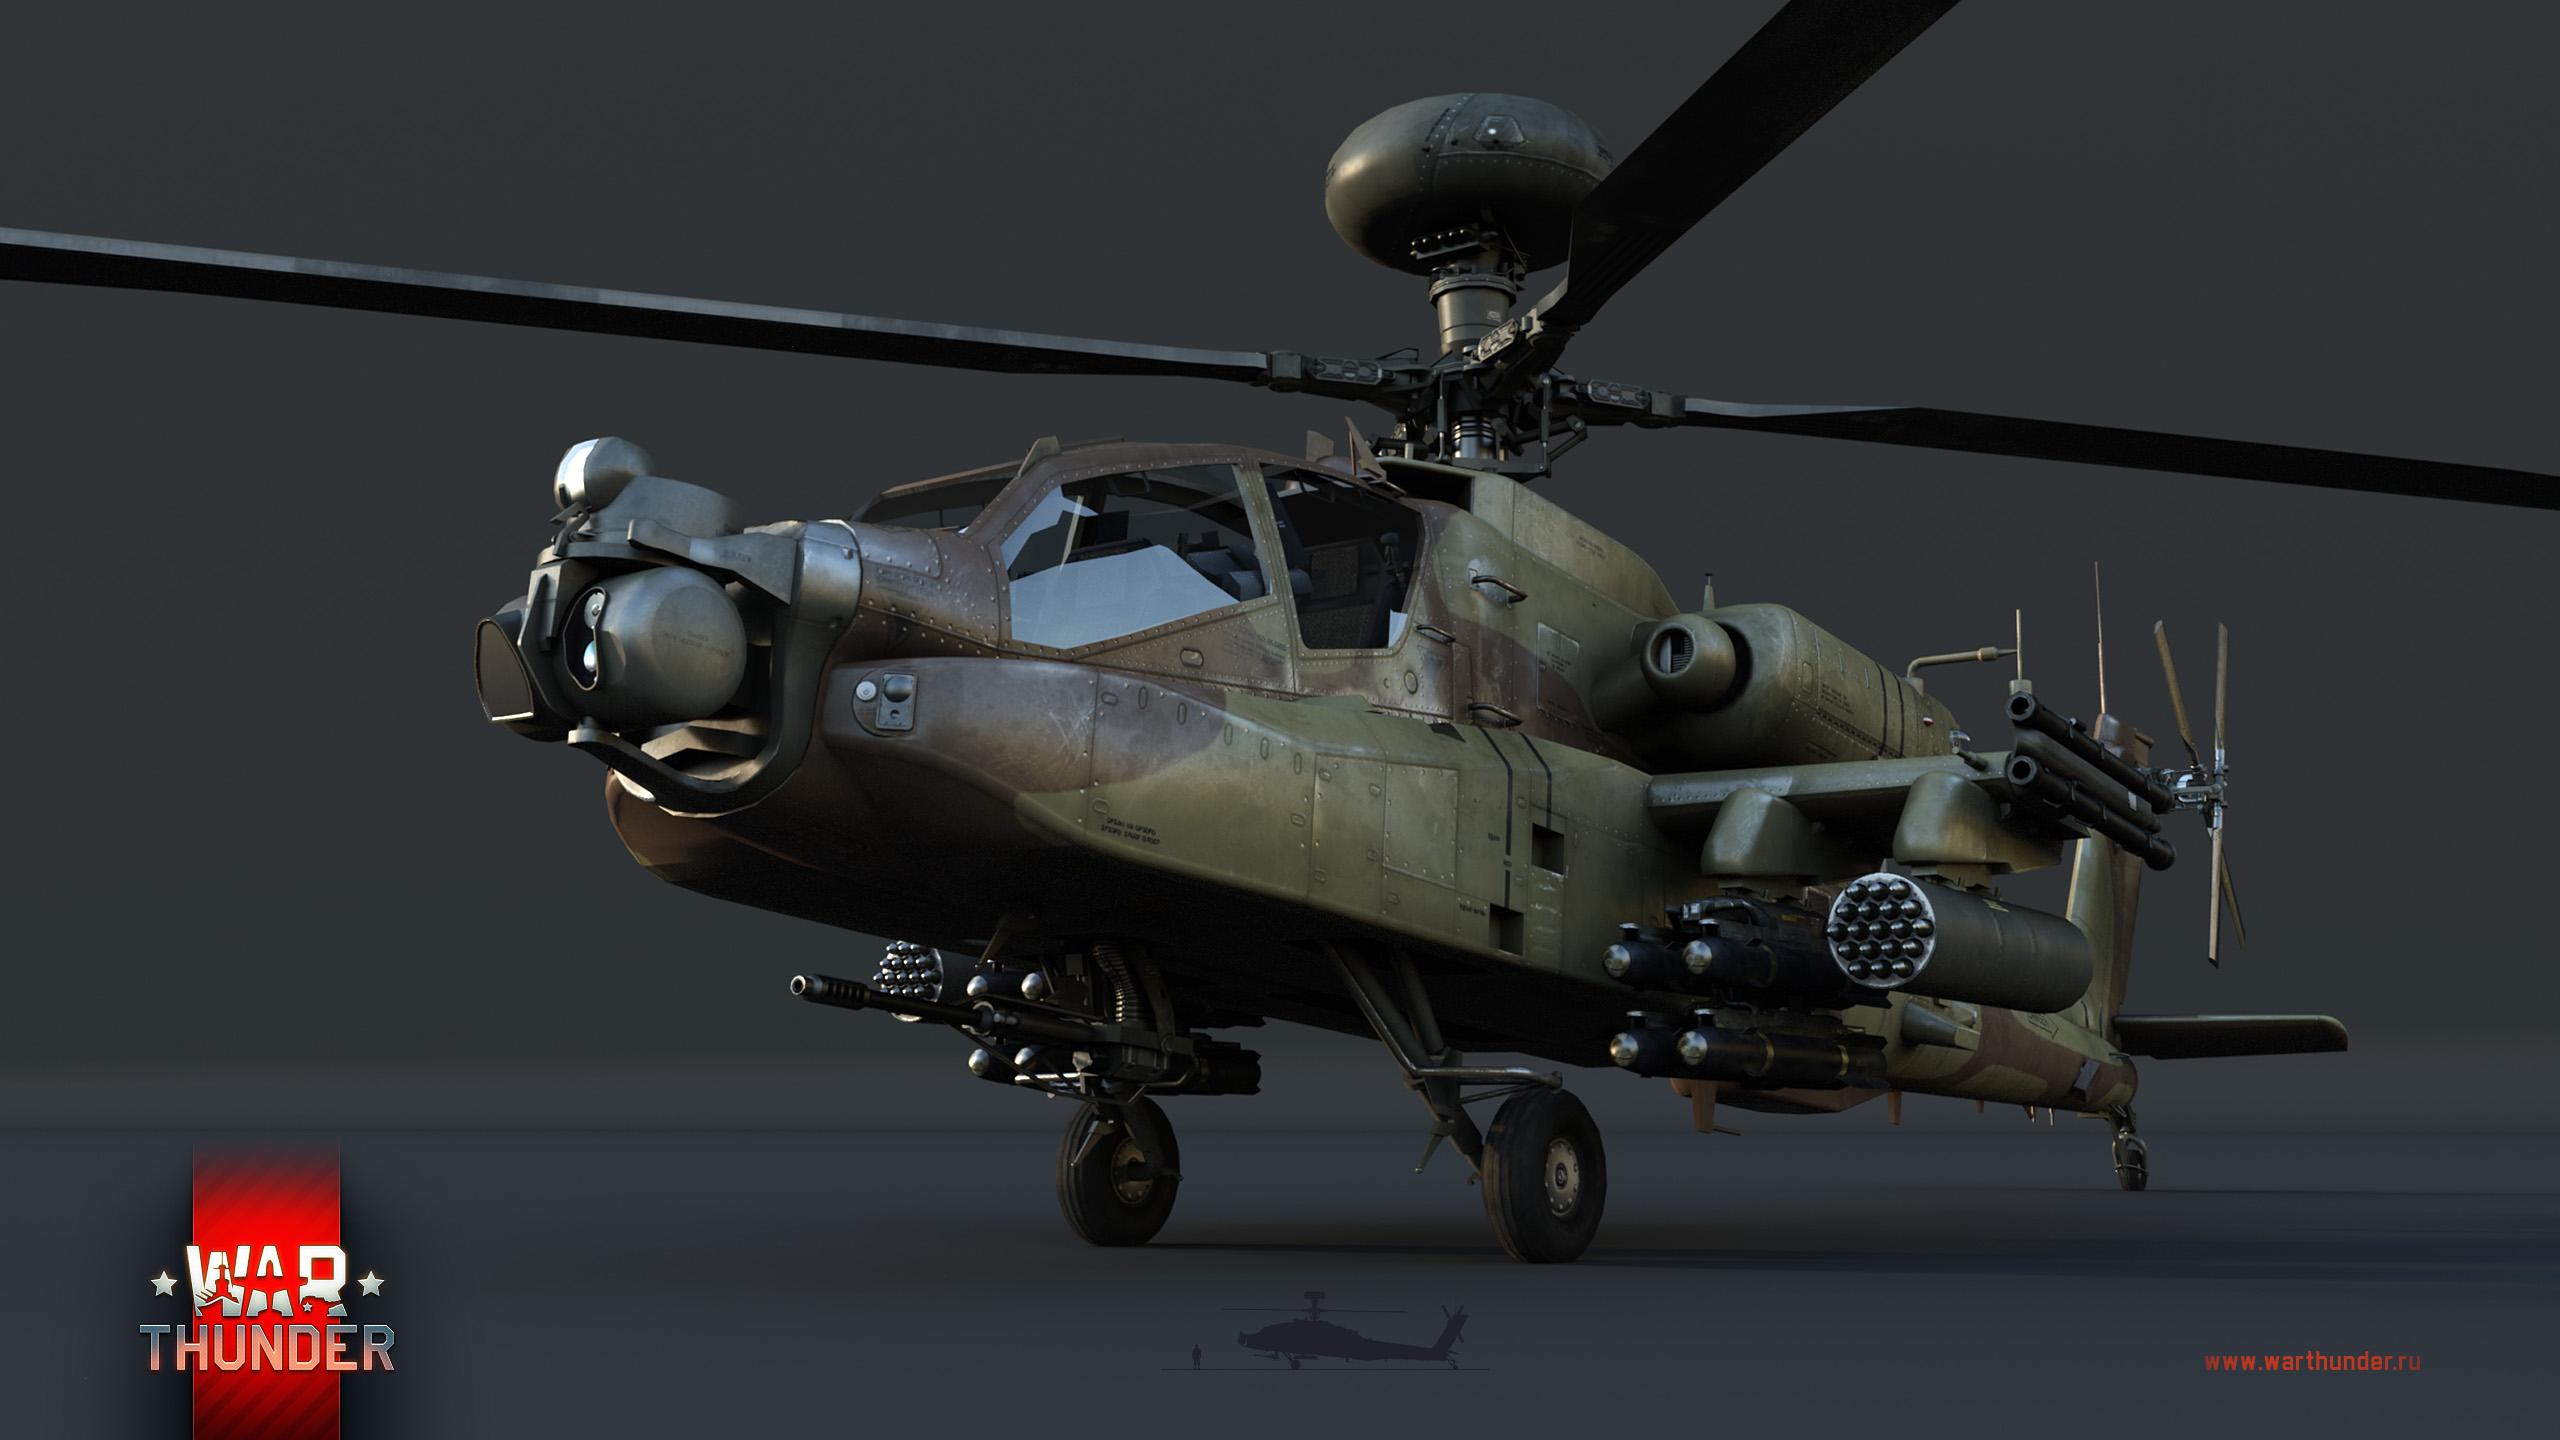 вар тандер вертолеты